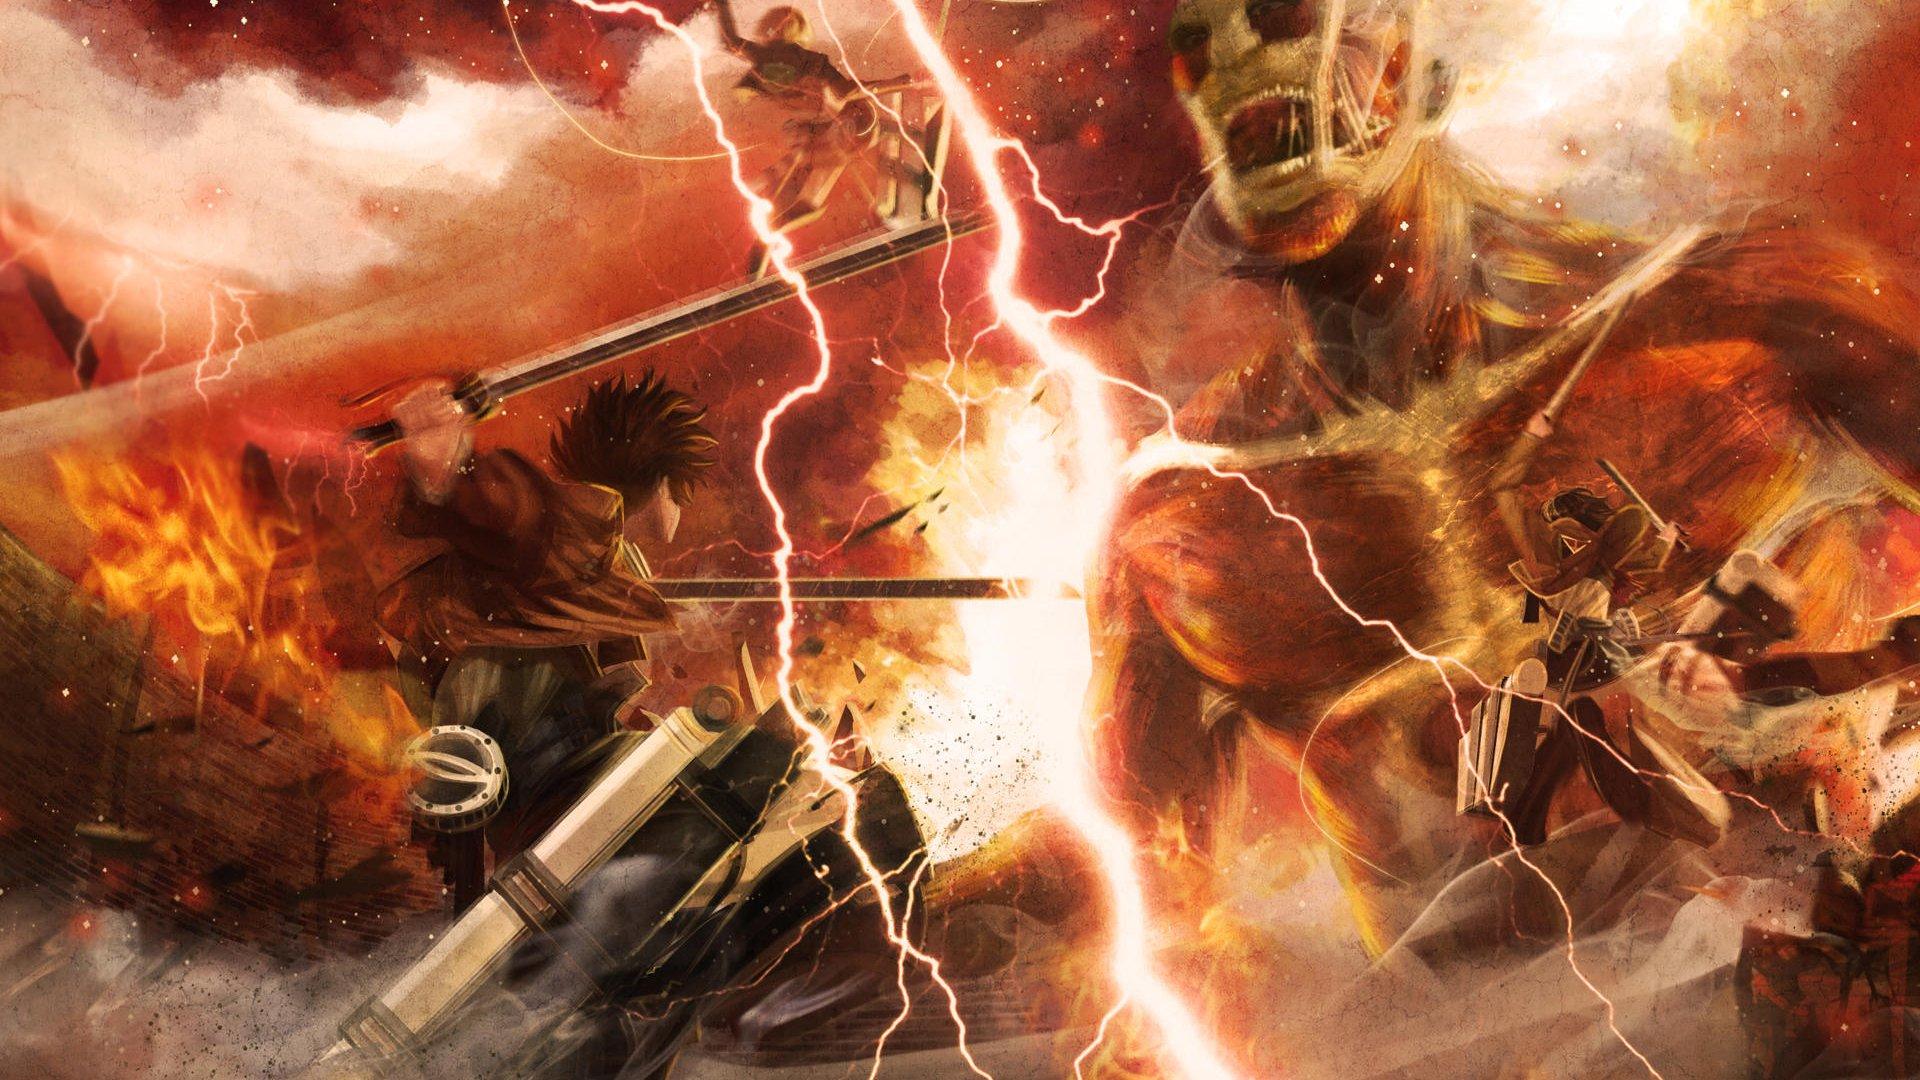 Season 2 Of ATTACK ON TITAN Delayed Until 2017